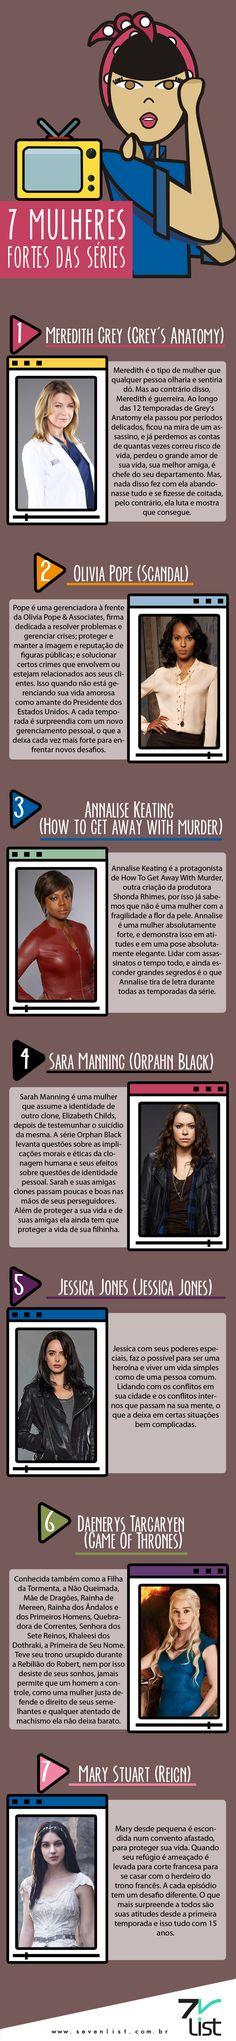 #Infográfico #Infographic #SevenList #Desenho #Illustration #Ilustração #Listas #List #Televisão #TVShow #AnnaliseKeating #DaenerysTargaryen #GameOfThrones #Girlpower #Grey'sAnatomy #How ToGetAwayWithMurder #Jessica Jones #Mary Stuart, #MeredithGrey #Mulheres #Netflix, #OlivaPope, #OrphanBlack #Reign #SaraManning #Scandal #Seriado #Séries #TV